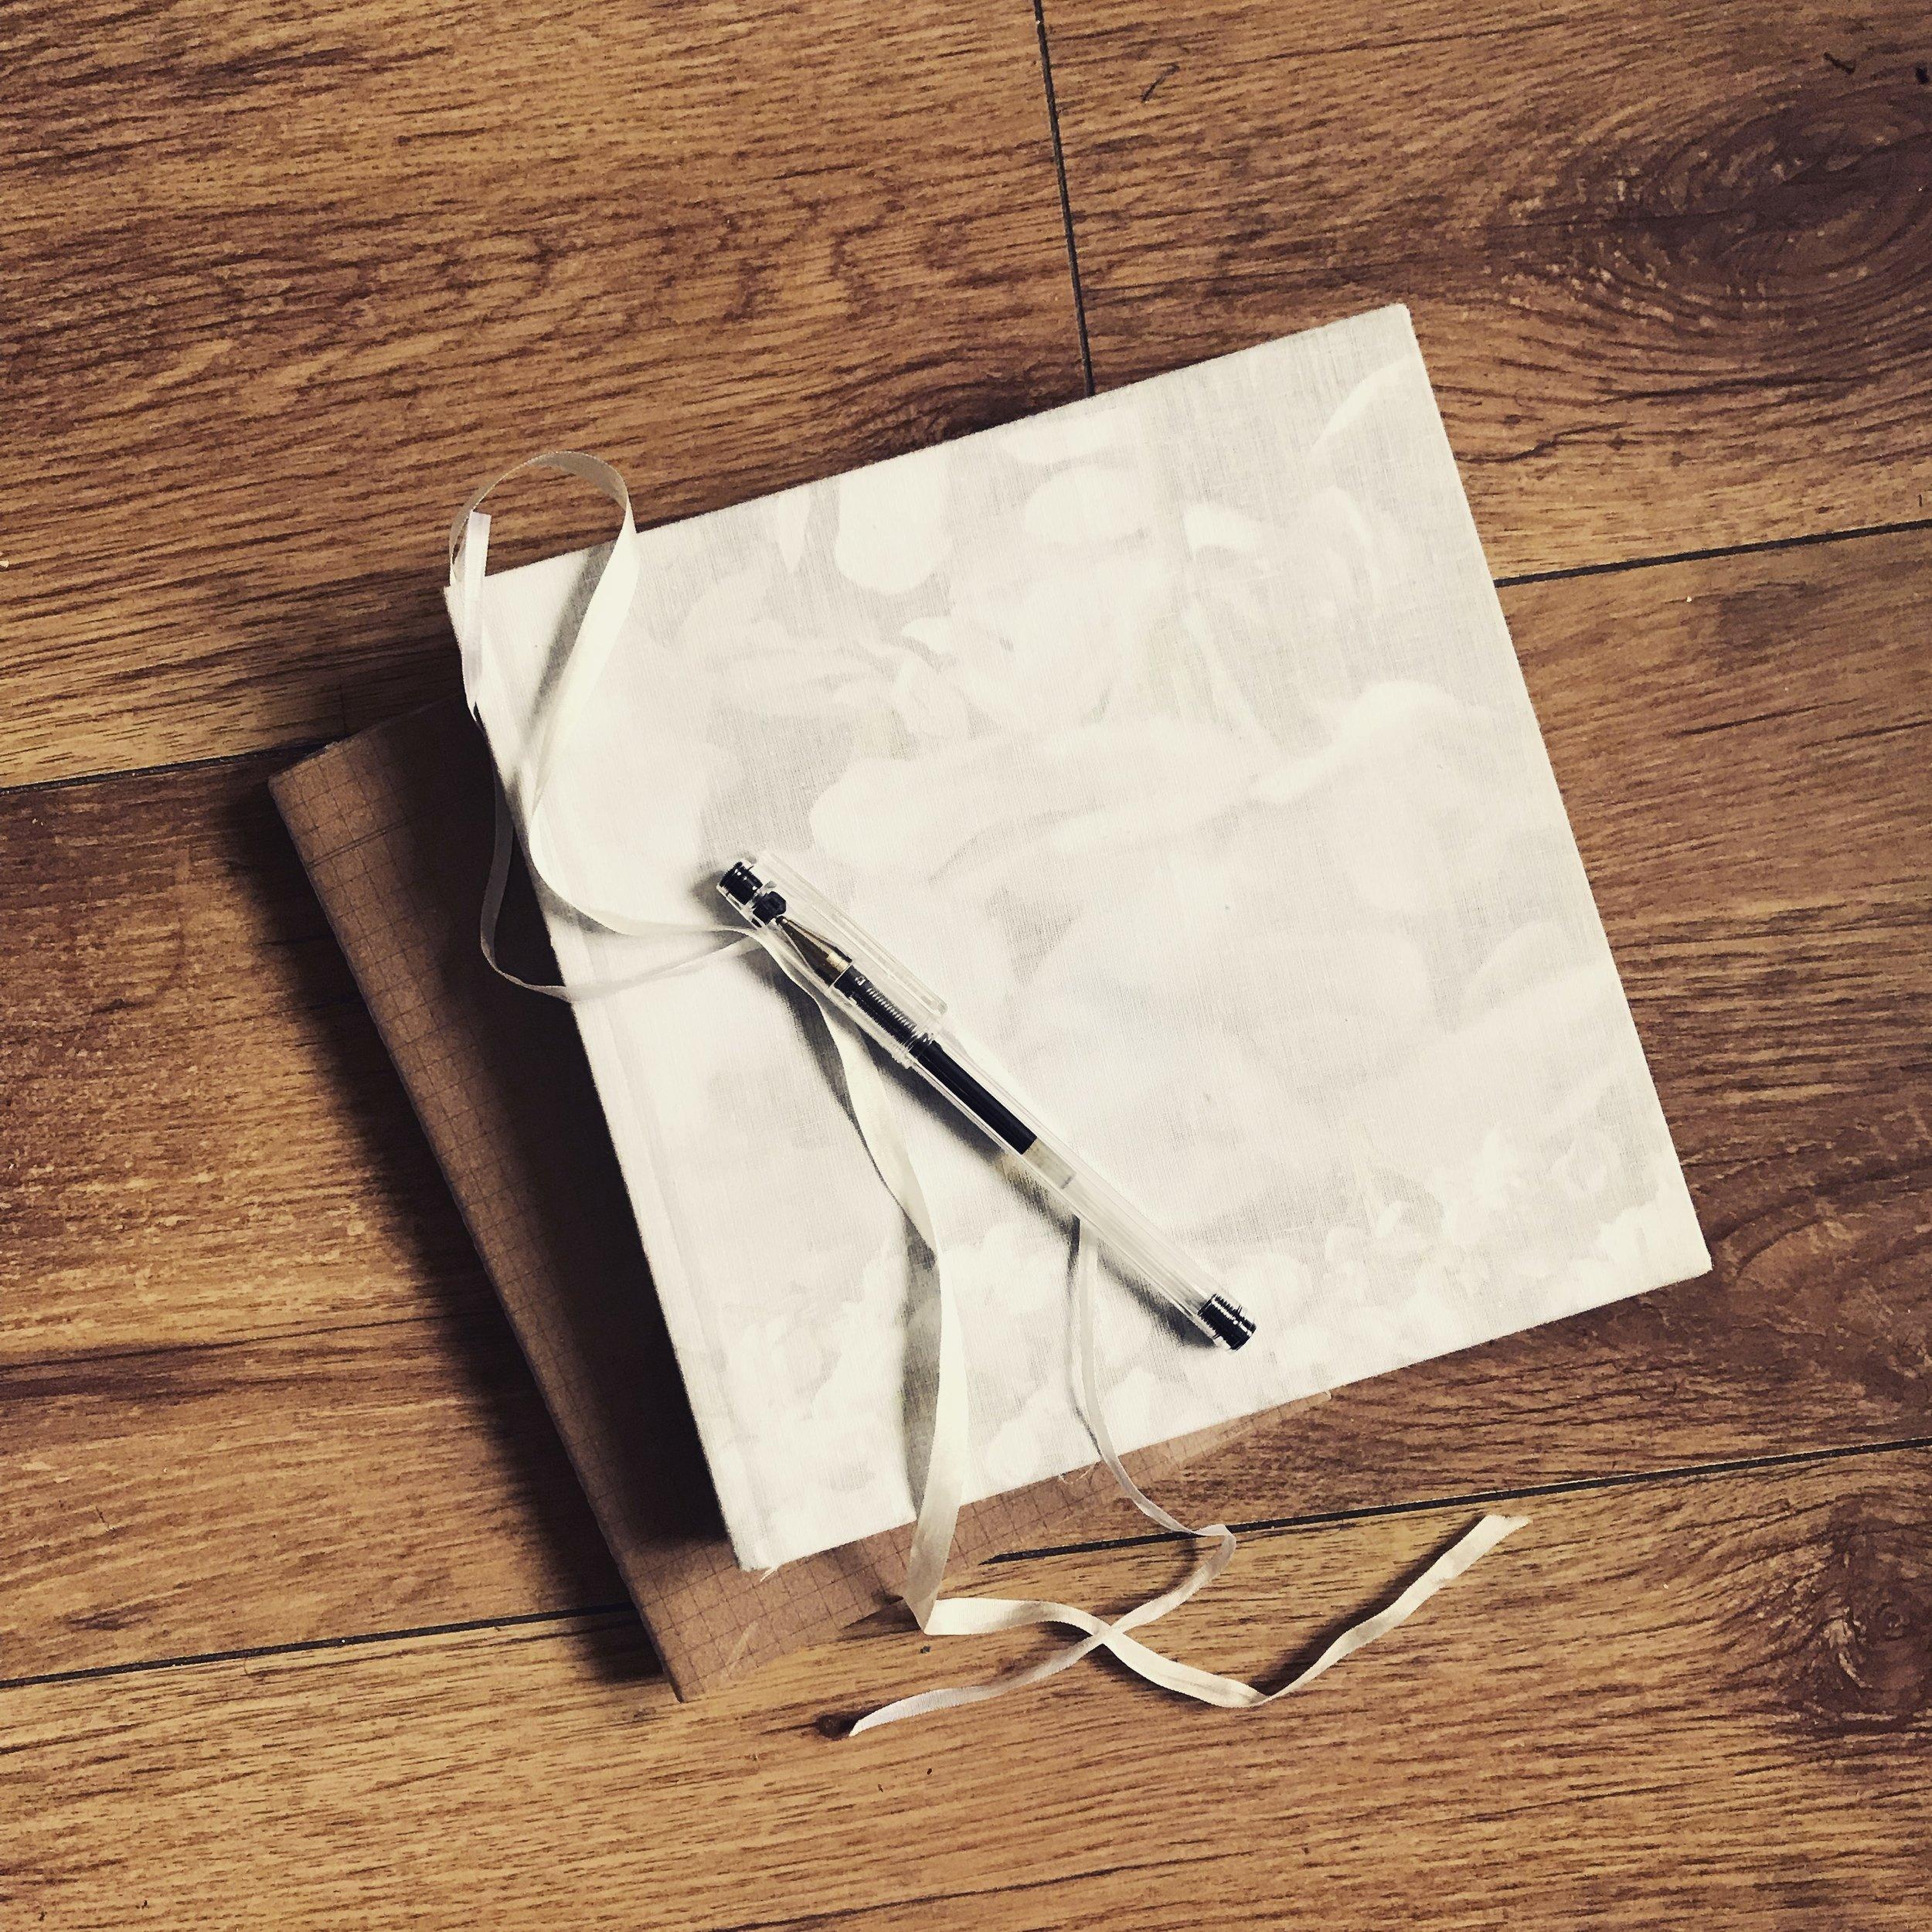 sketchbooks+by+csevenm.JPG